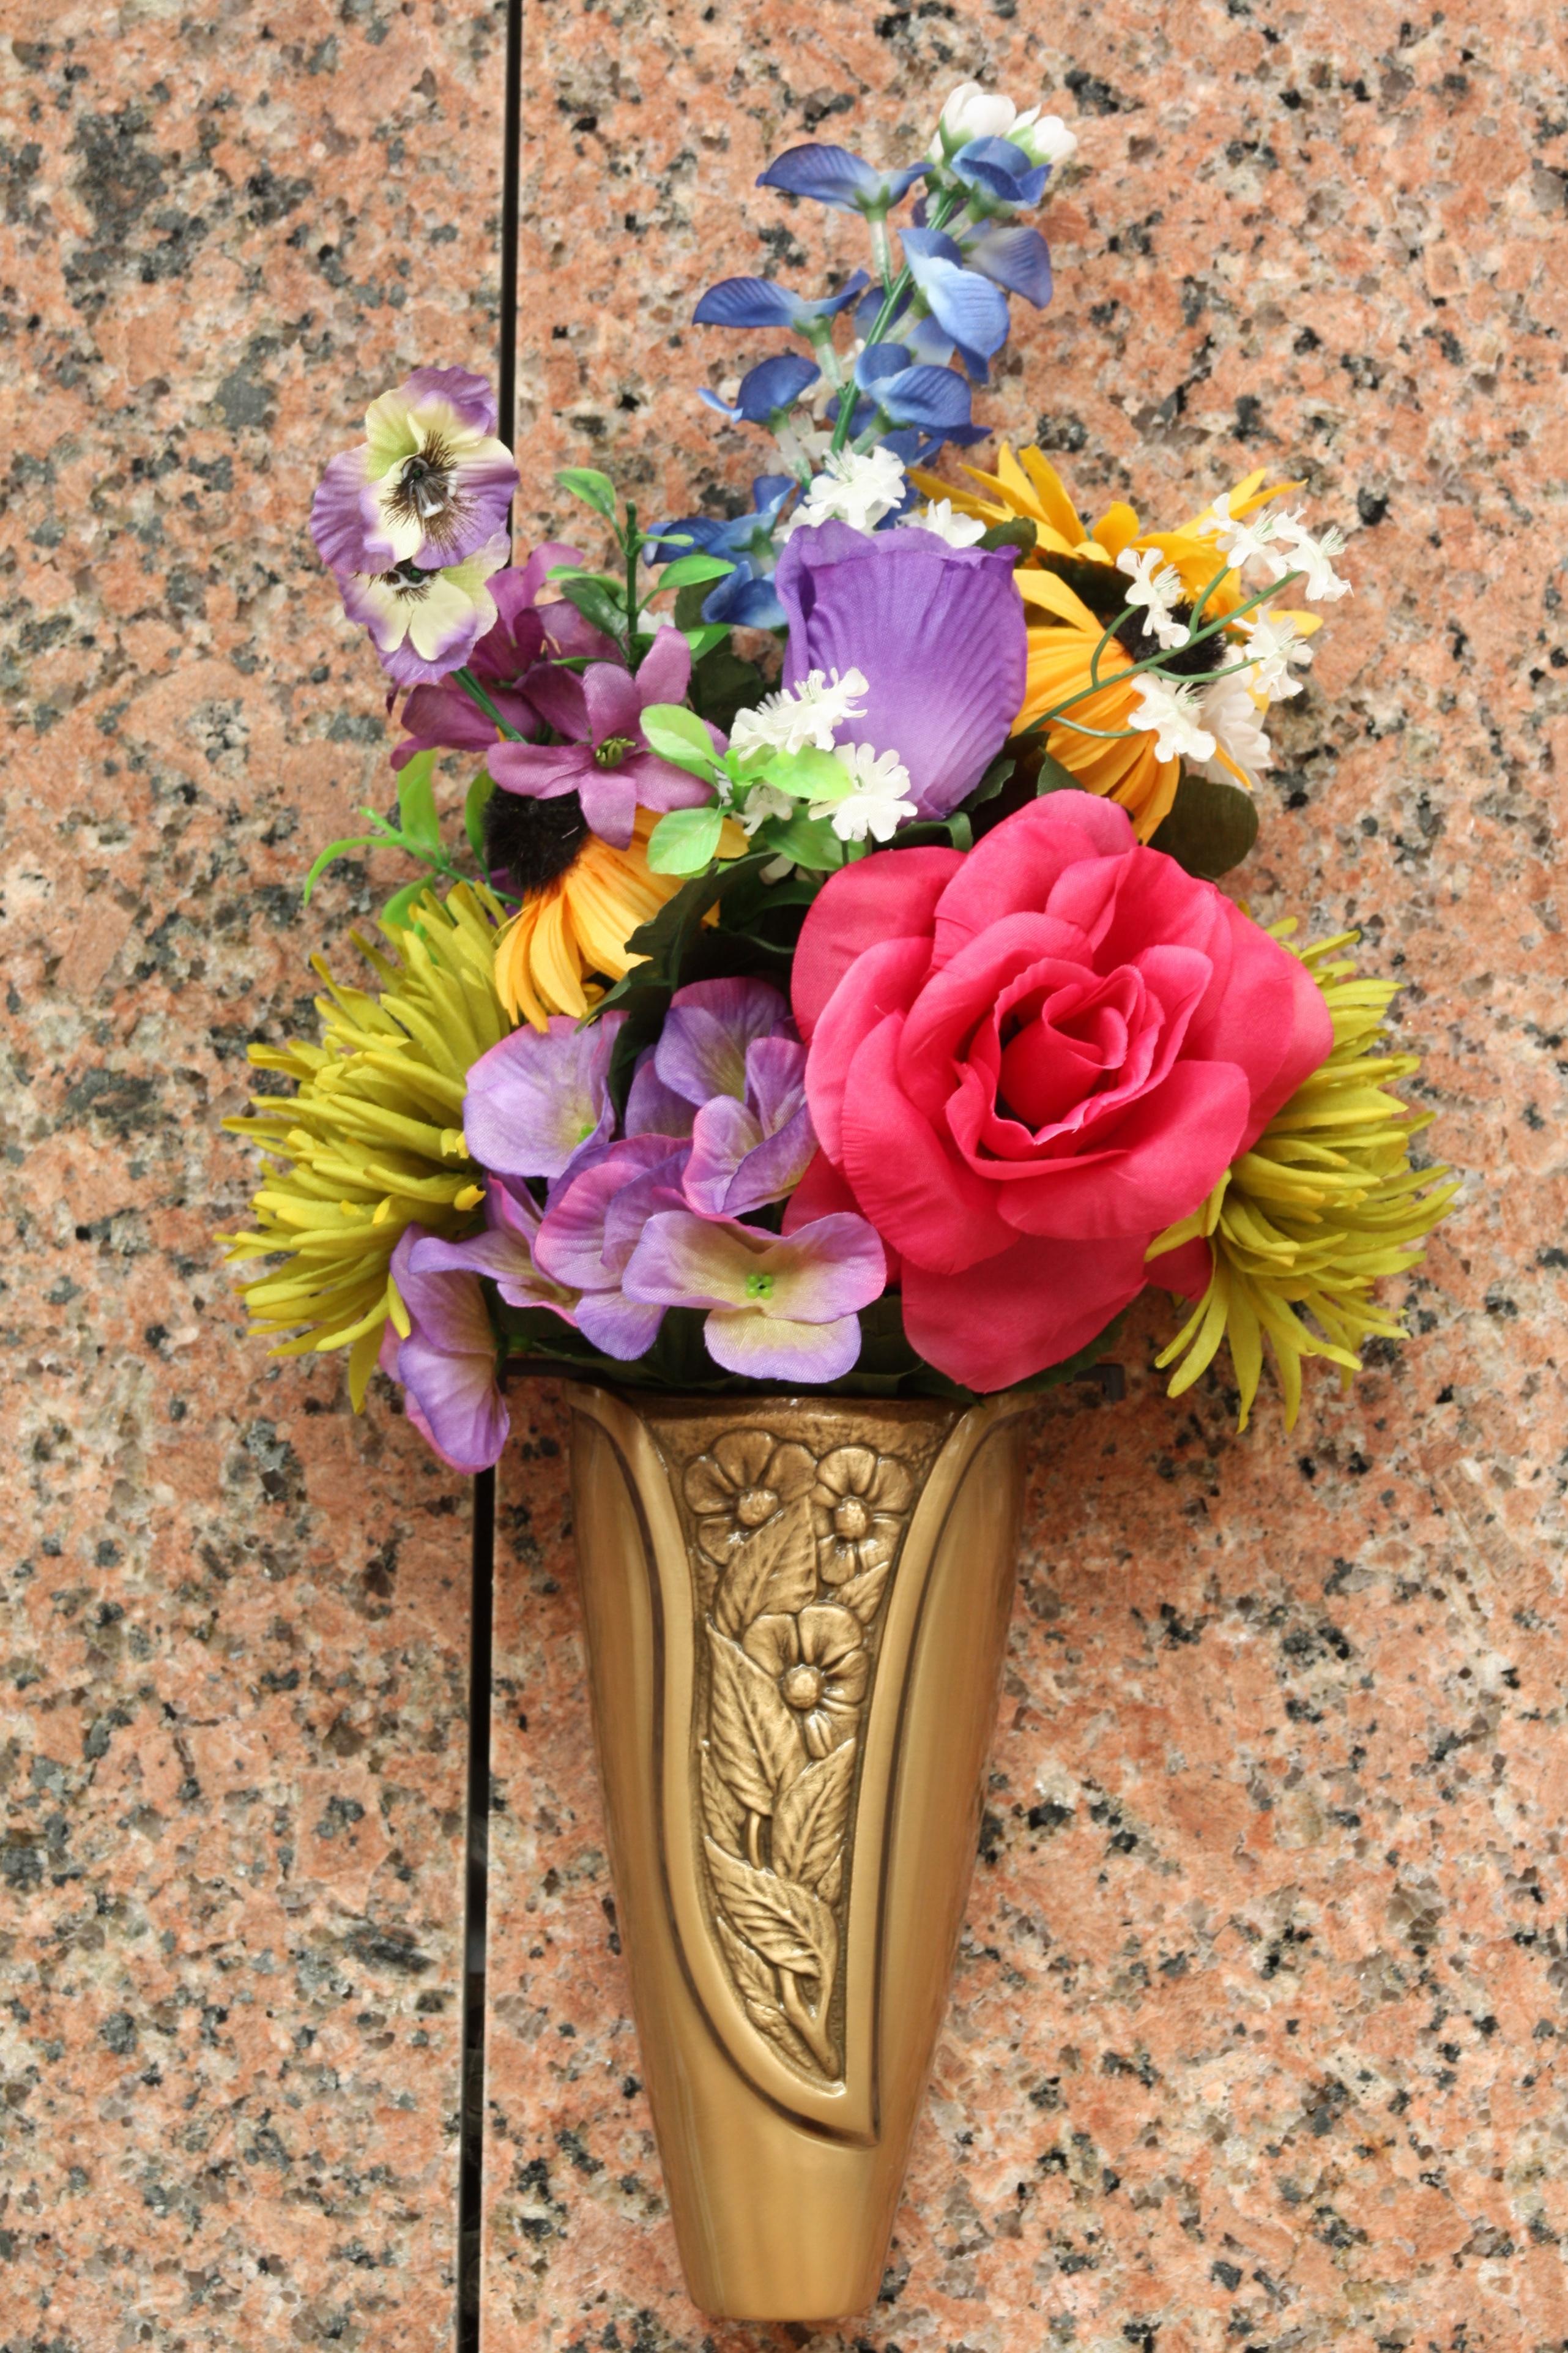 Memorialization South Jersey Catholic Cemeteries